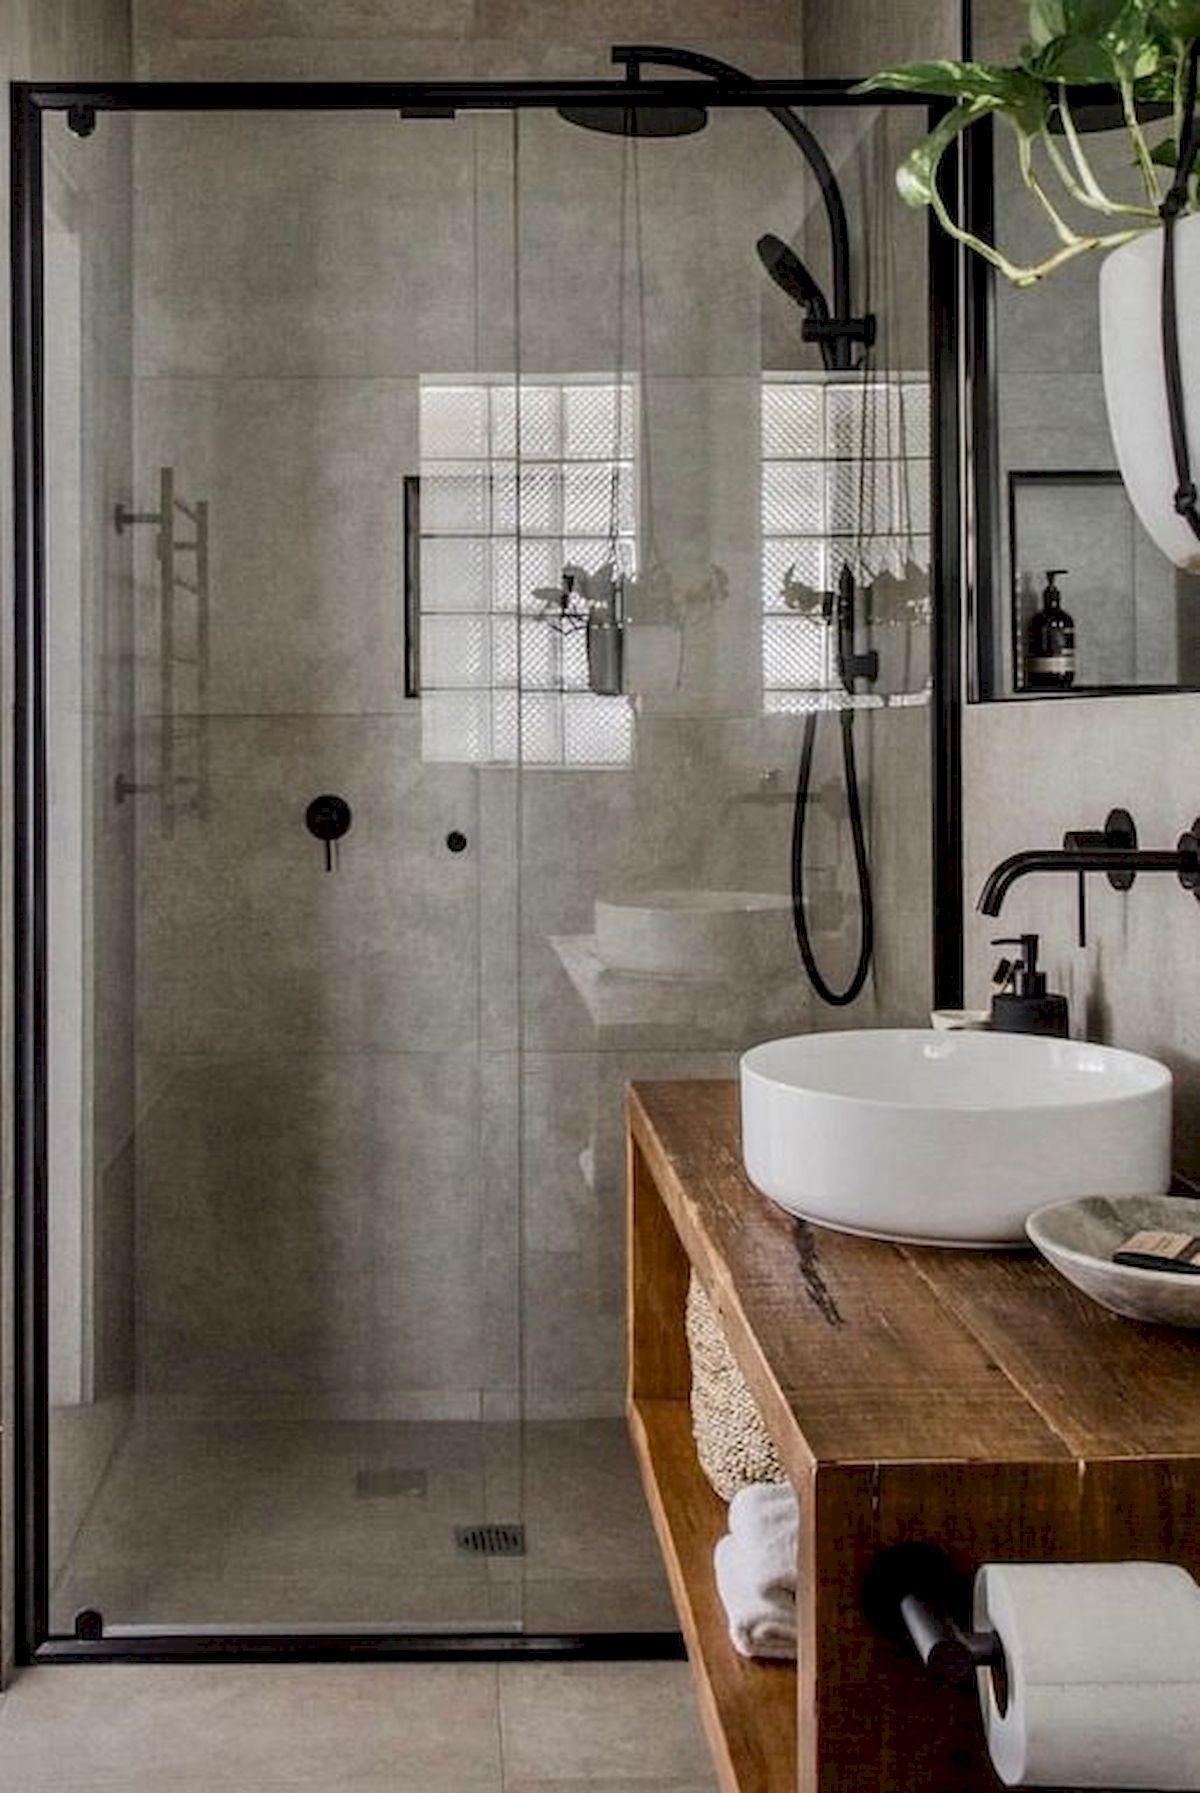 11 Best Industrial Style Bathrooms Ideas11DECOR in 11